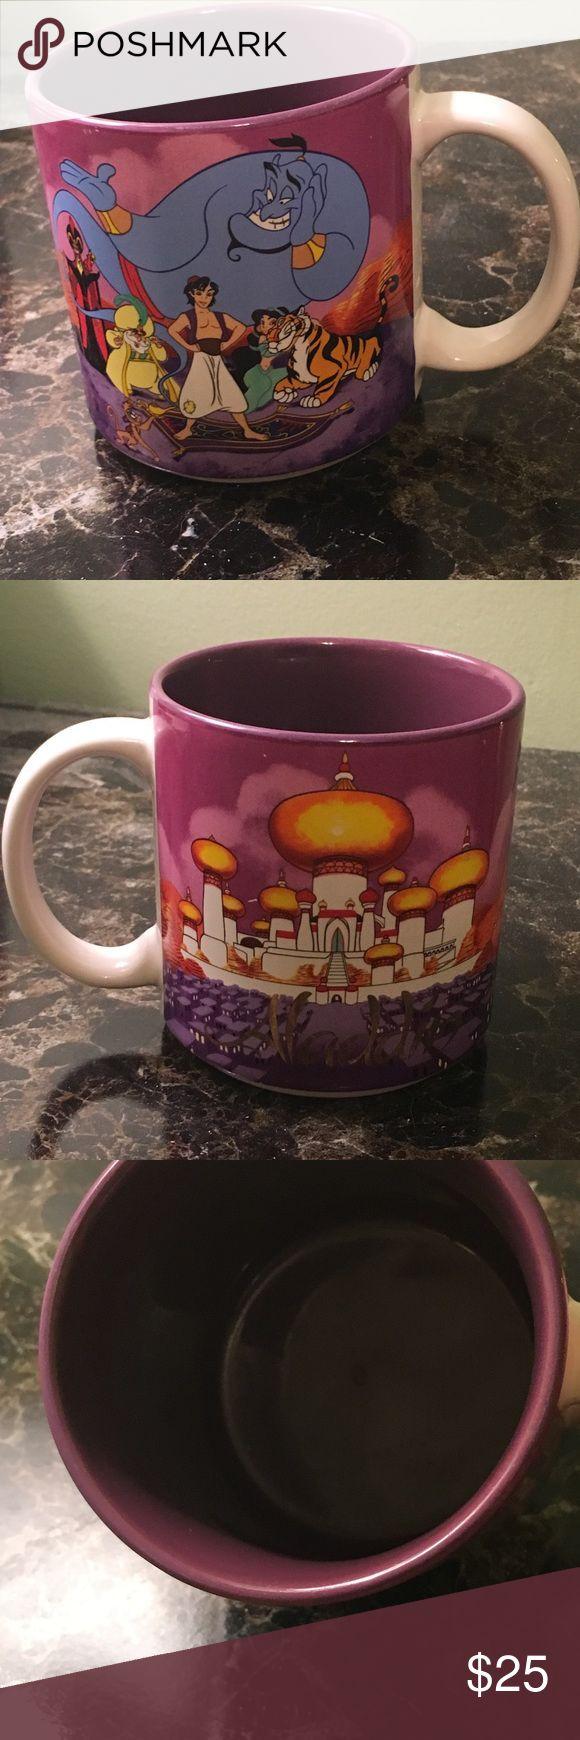 Amazon aladdin coffee mugs - Disney Aladdin Mug Retro Ware Classic Coffee Mug